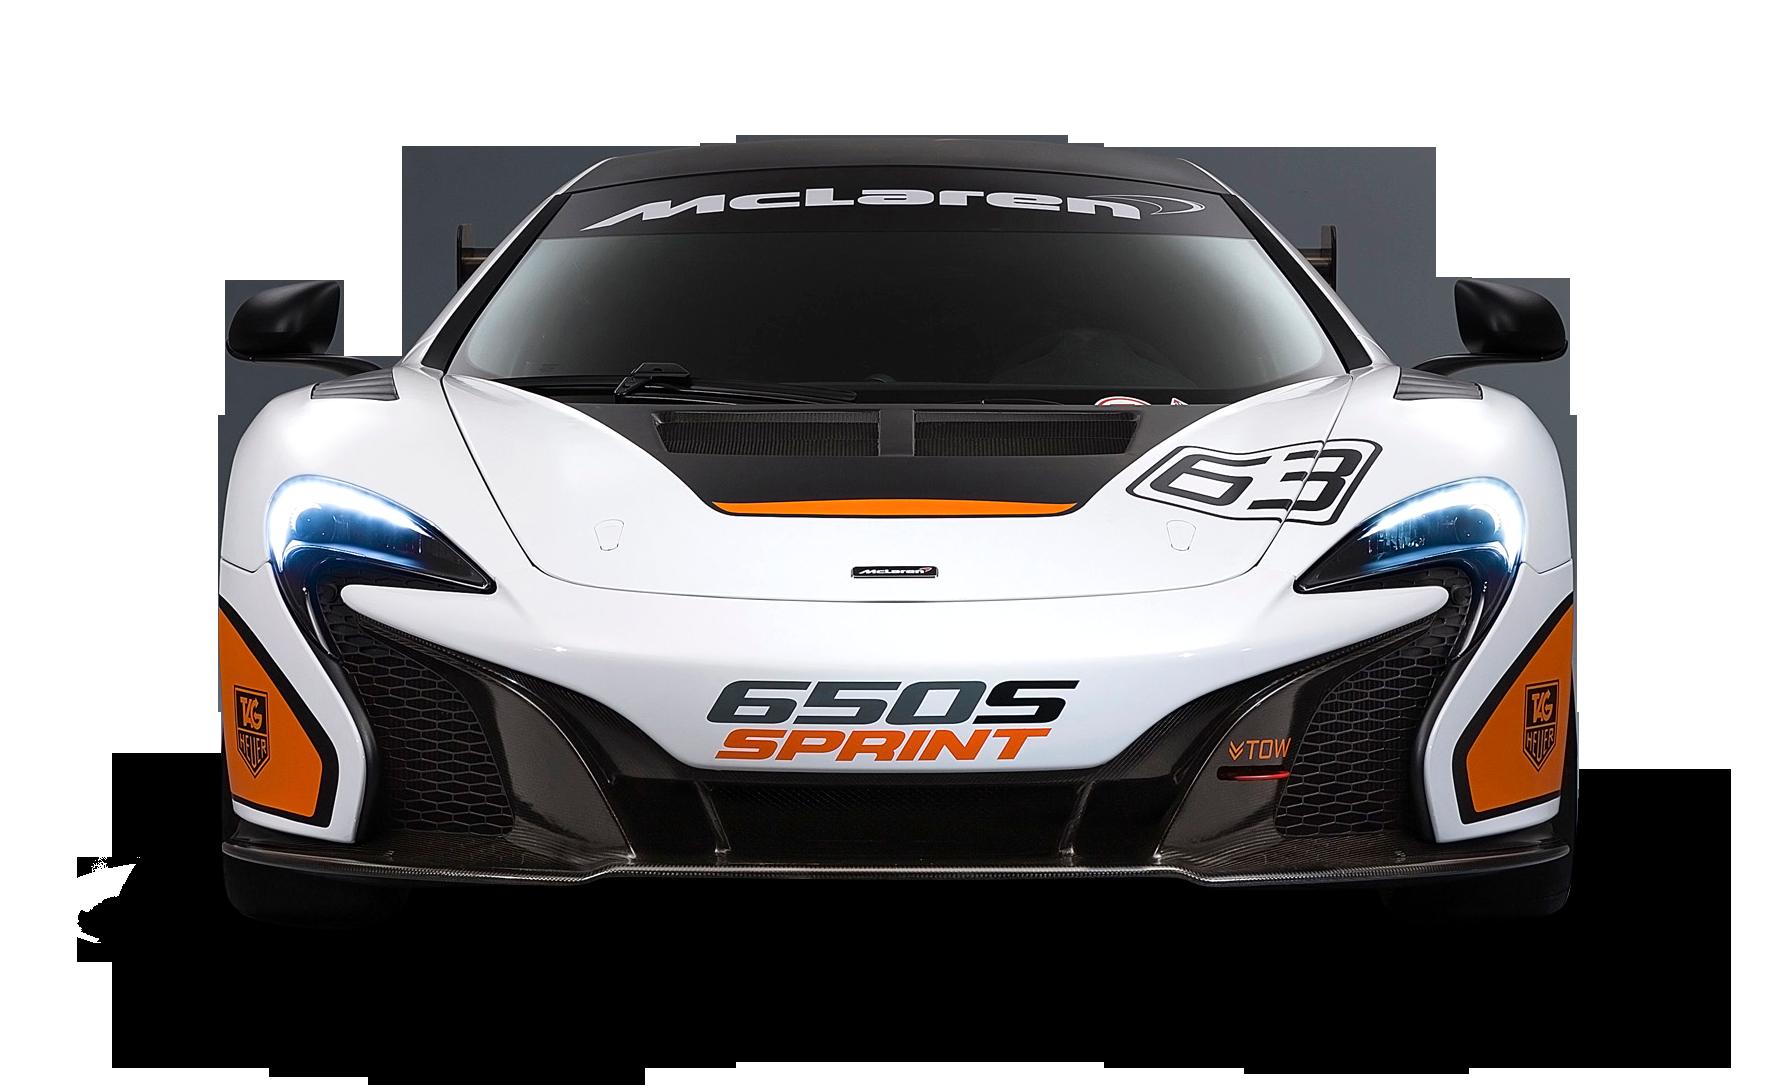 Sprint car racing clipart svg free download White McLaren 650S Sprint Car PNG Image - PurePNG | Free transparent ... svg free download